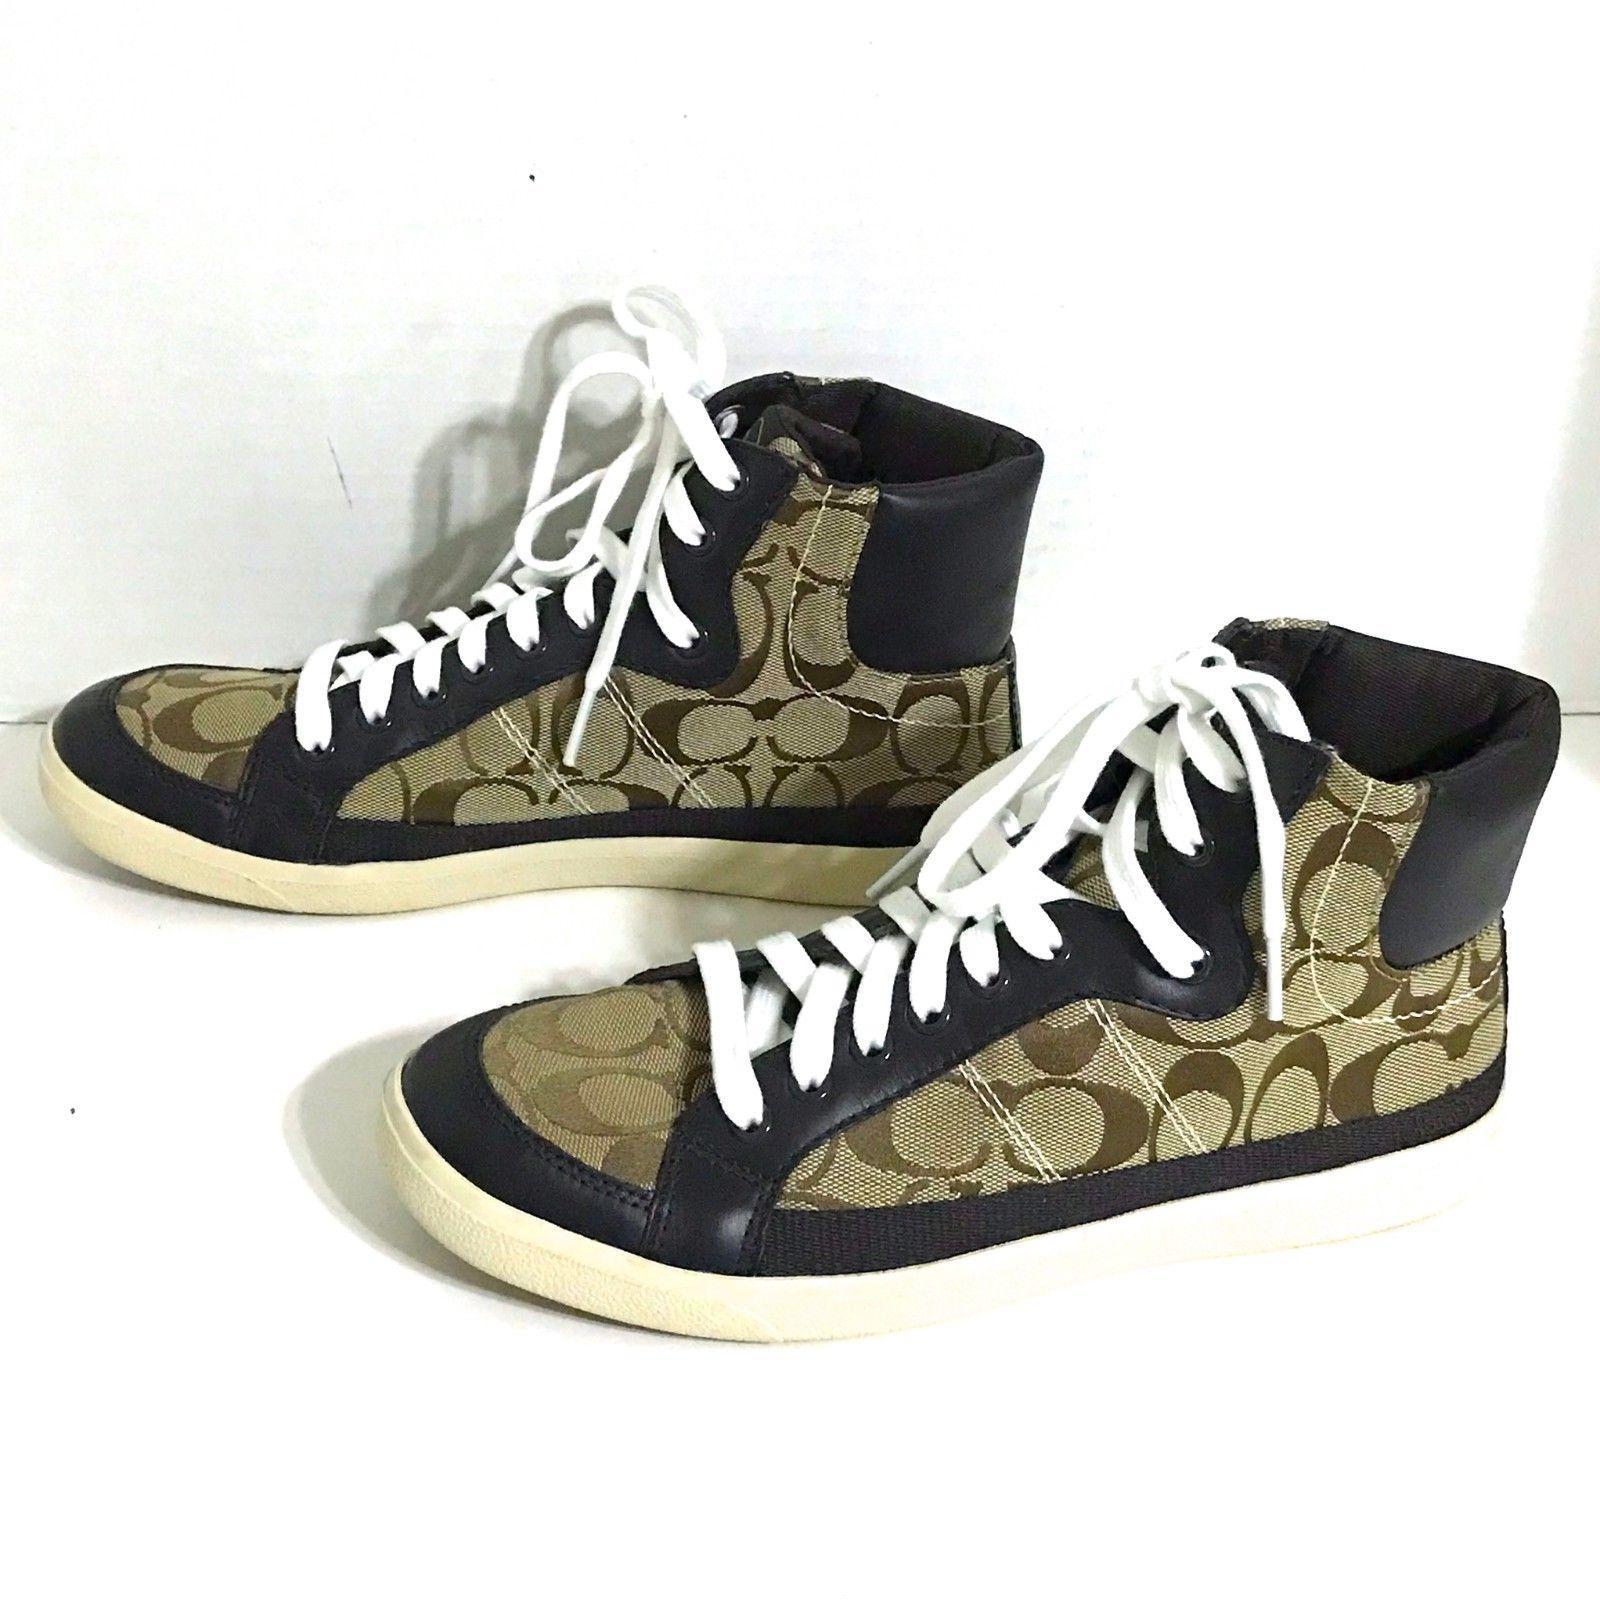 nwob ellis high tops shoes size 8